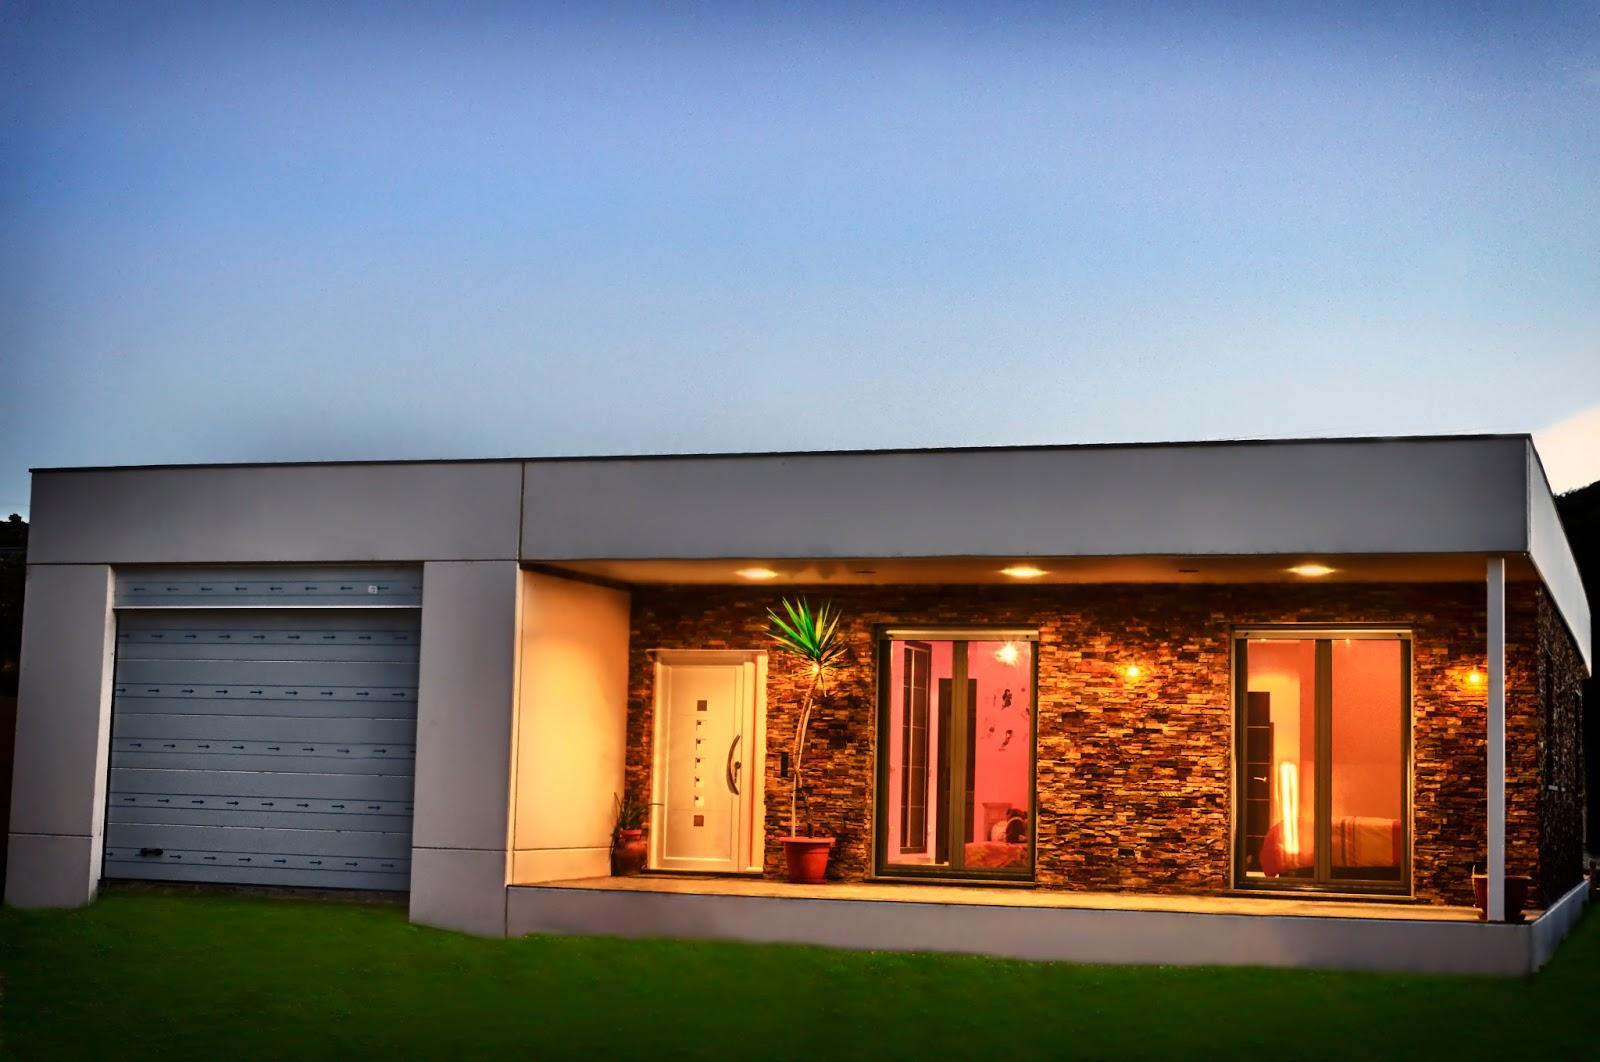 Casas de madera prefabricadas casas prefabricadas de for Casas prefabricadas modernas